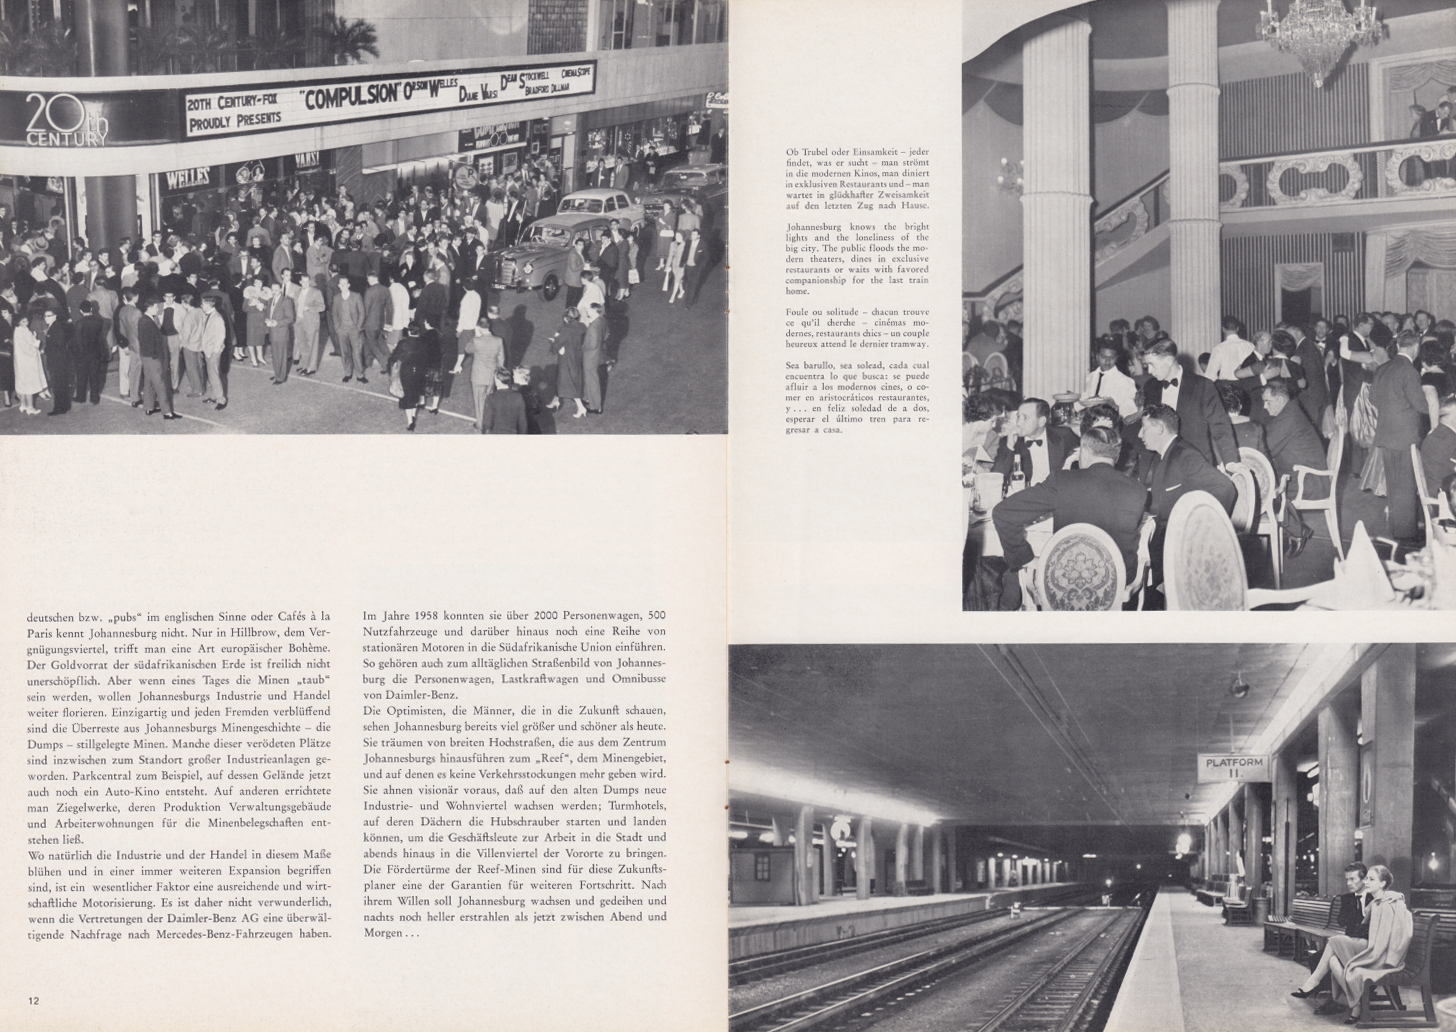 (REVISTA): Periódico In aller welt n.º 34 - Mercedes-Benz no mundo - 1959 - multilingue 007